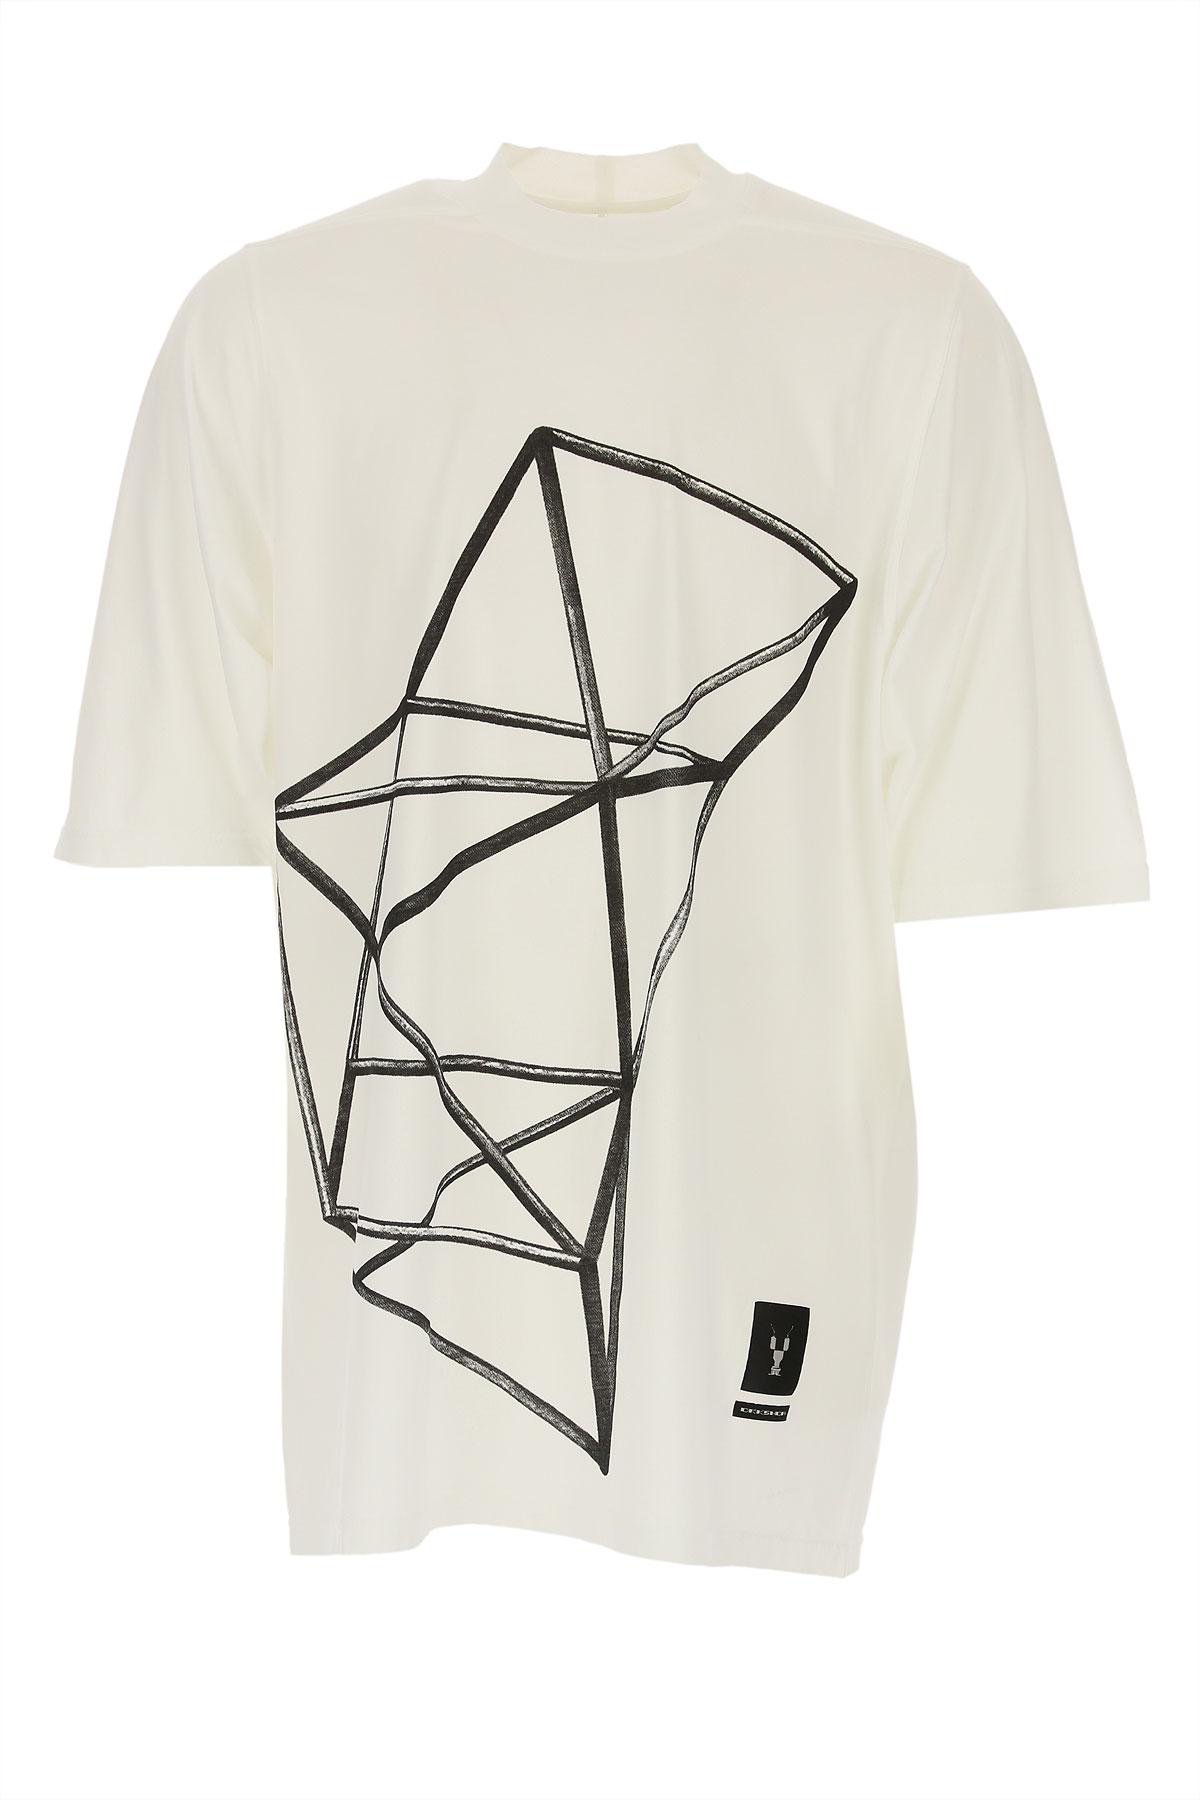 Rick Owens DRKSHDW T-Shirt for Men On Sale in Outlet, Milk, Cotton, 2019, L M S XL